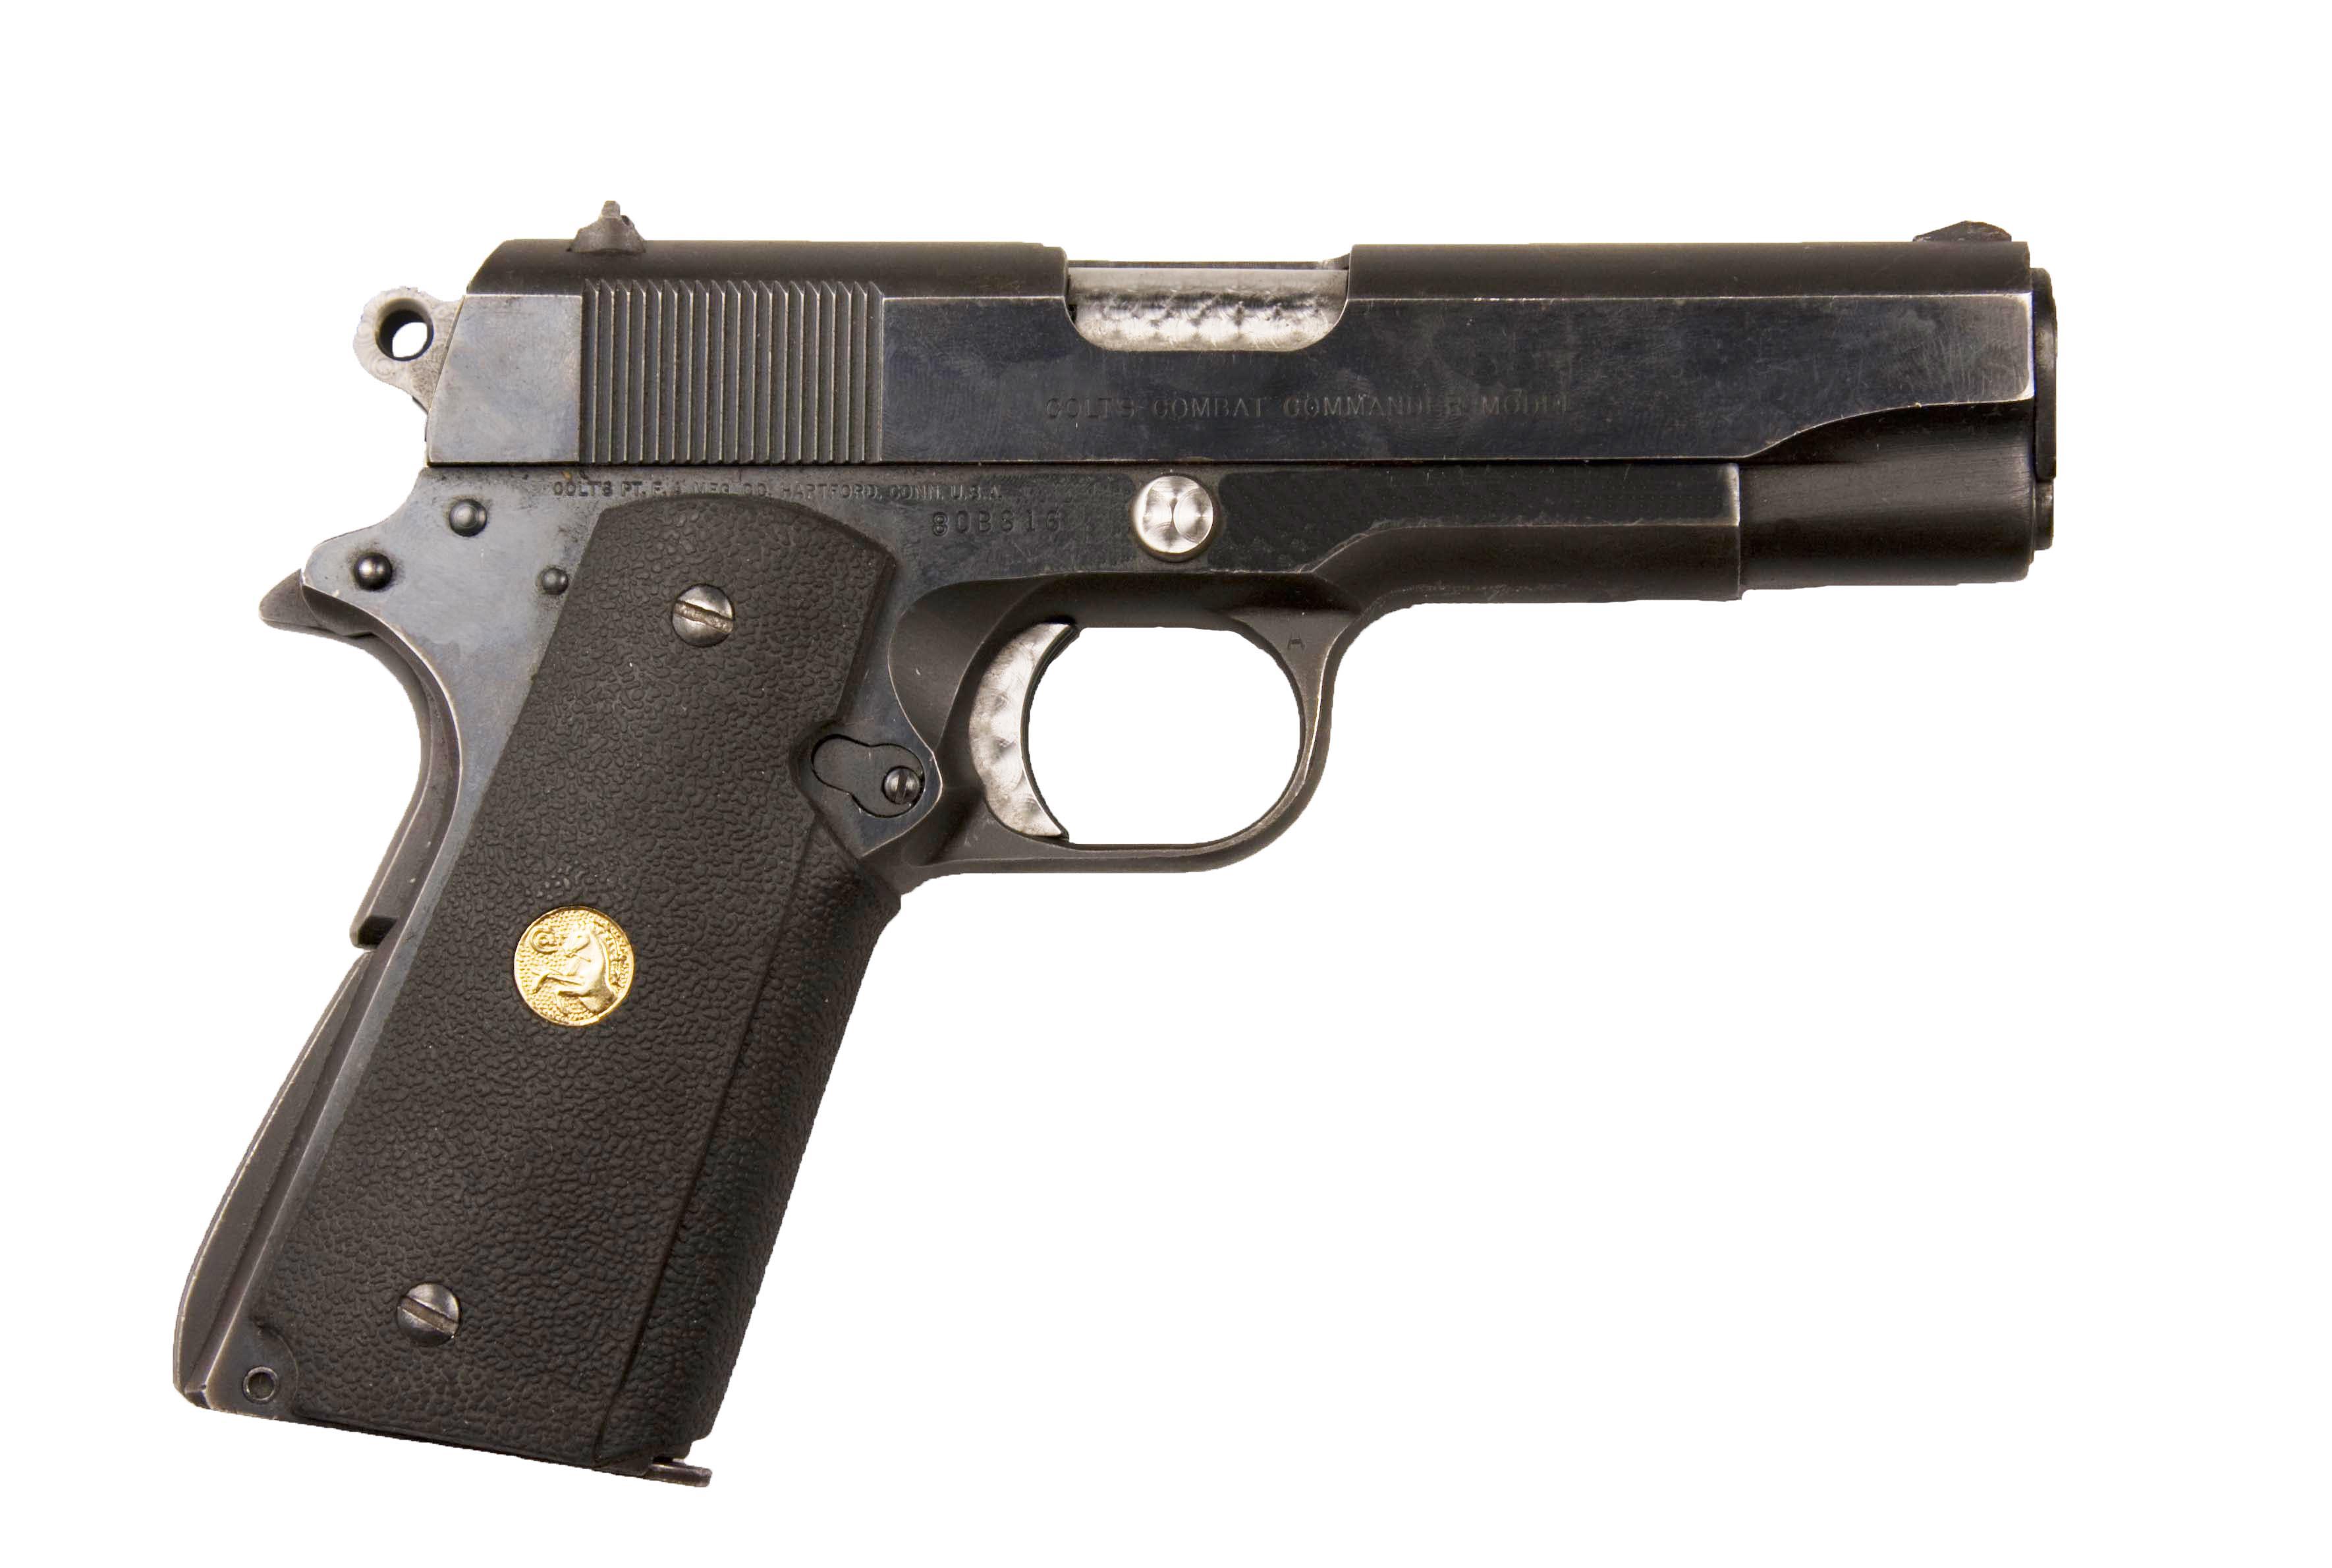 Colt_CombatCommander